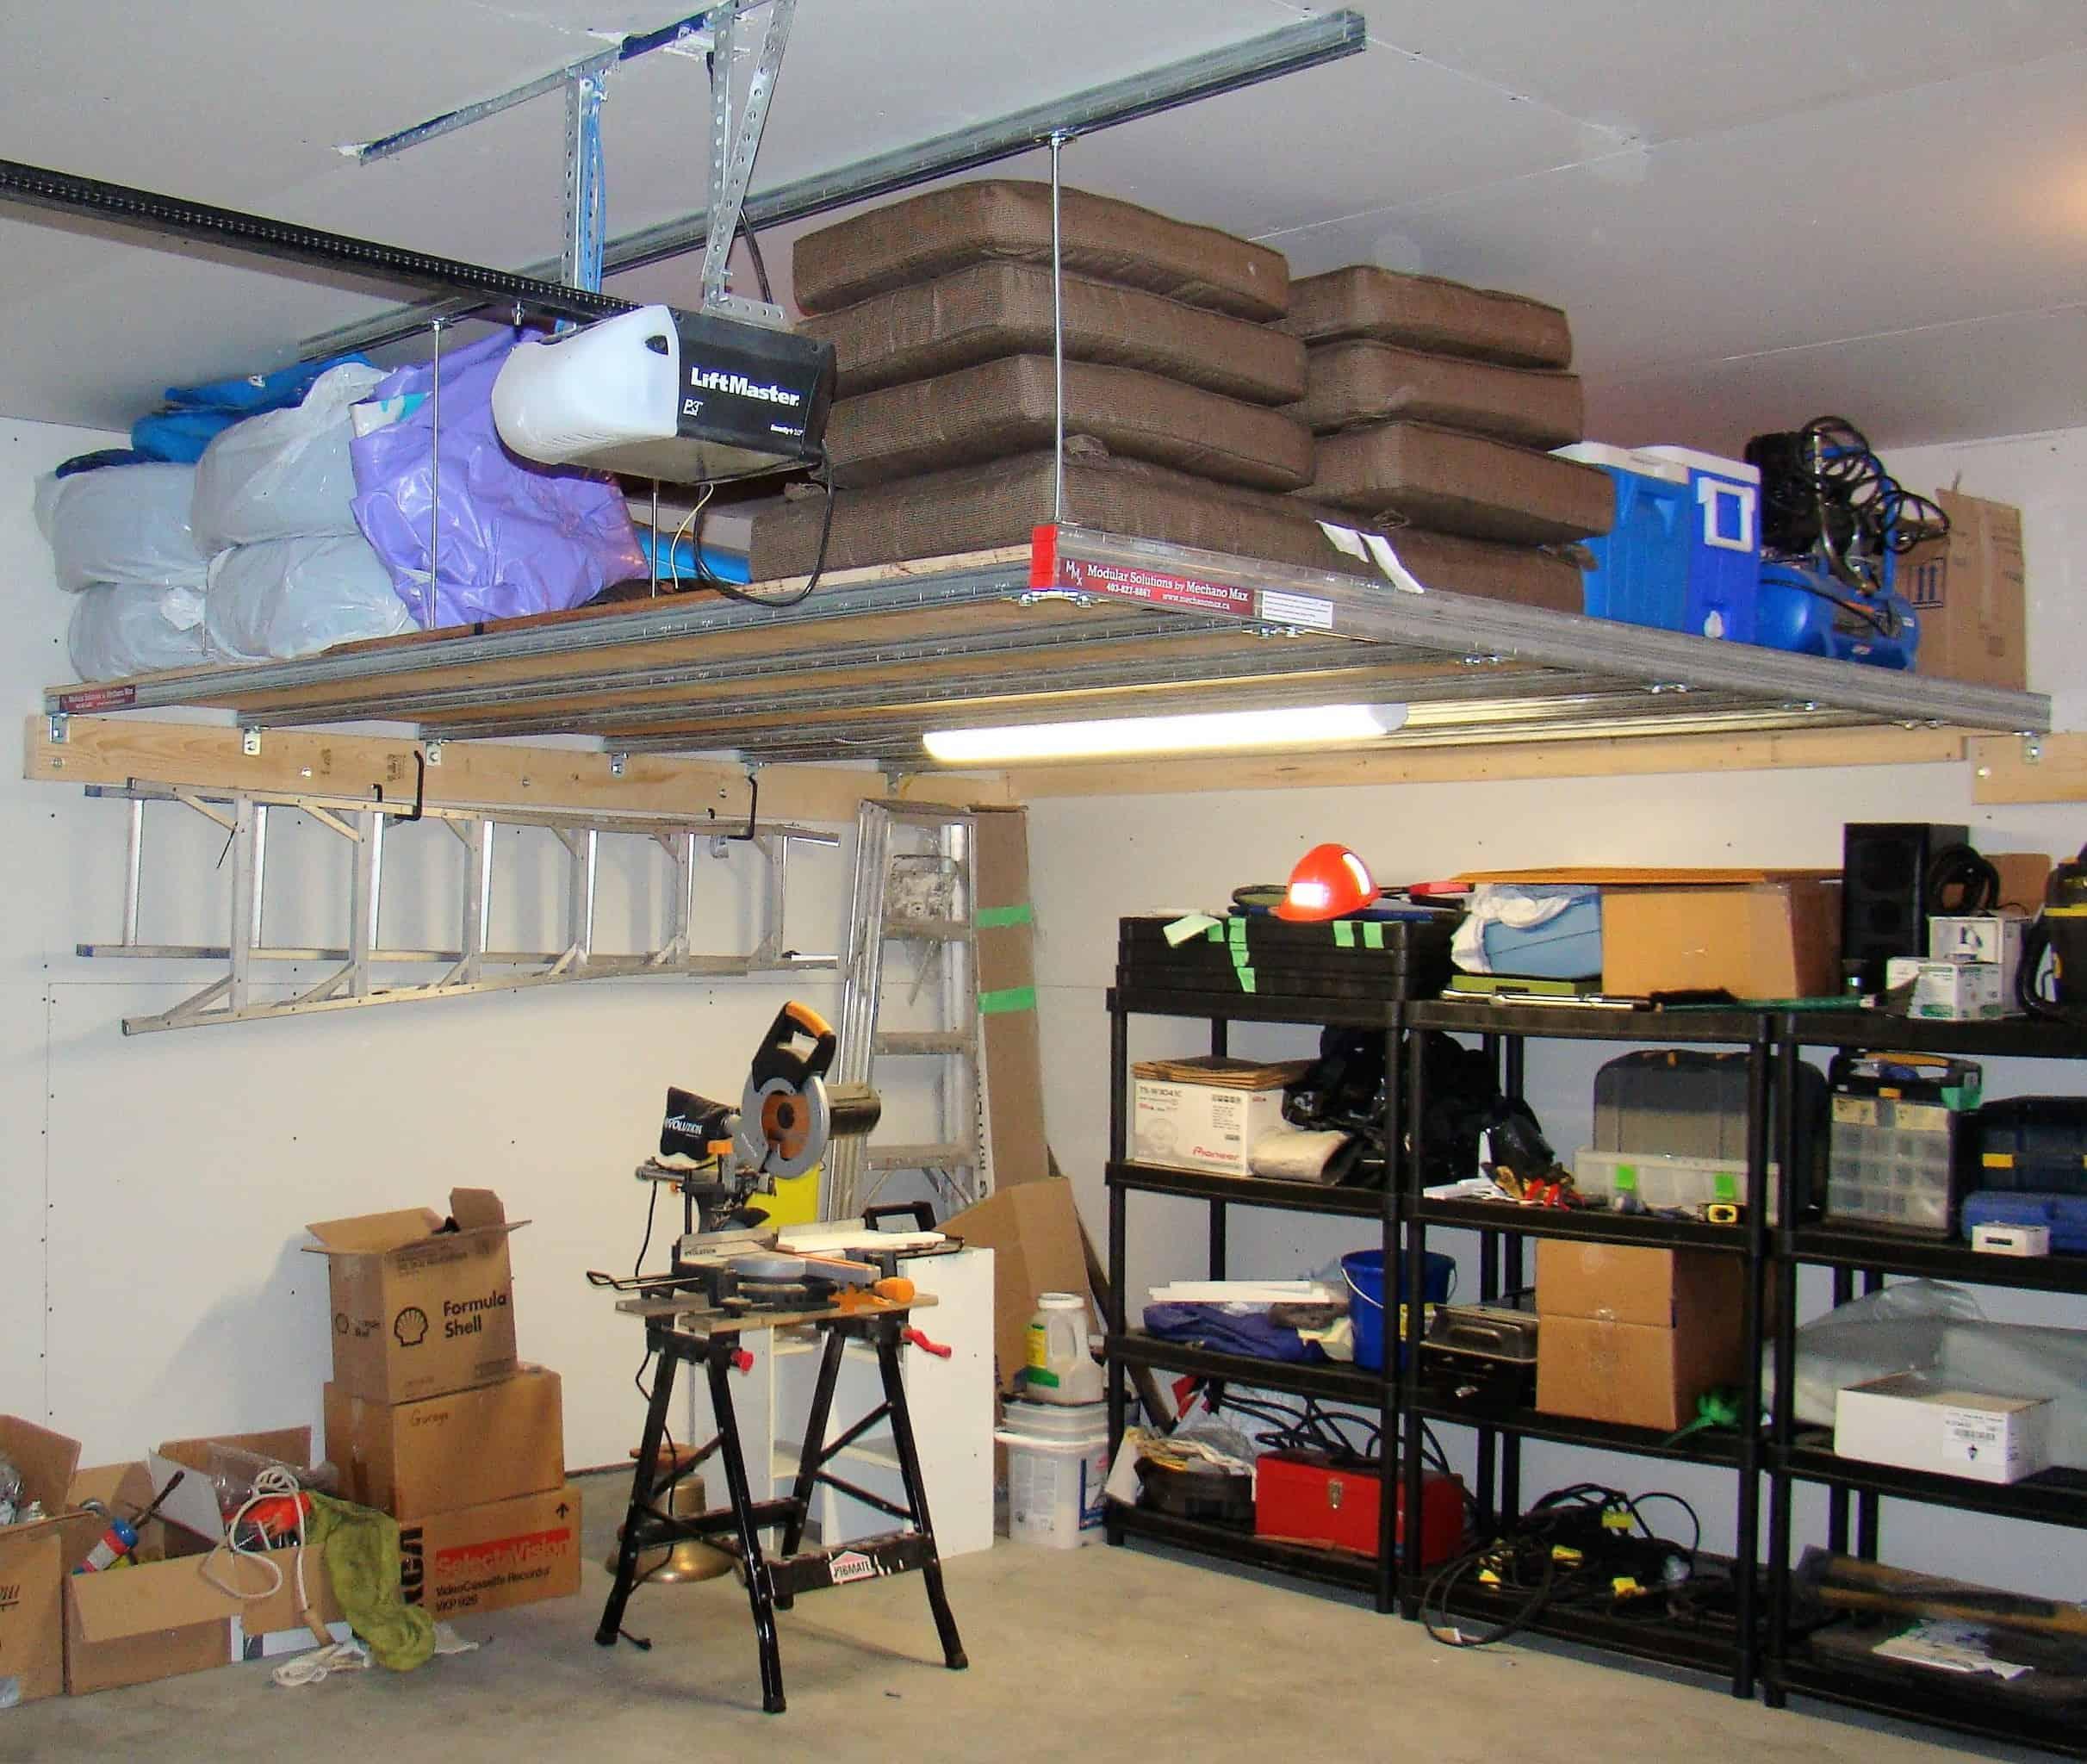 Storage Above Work Space Below